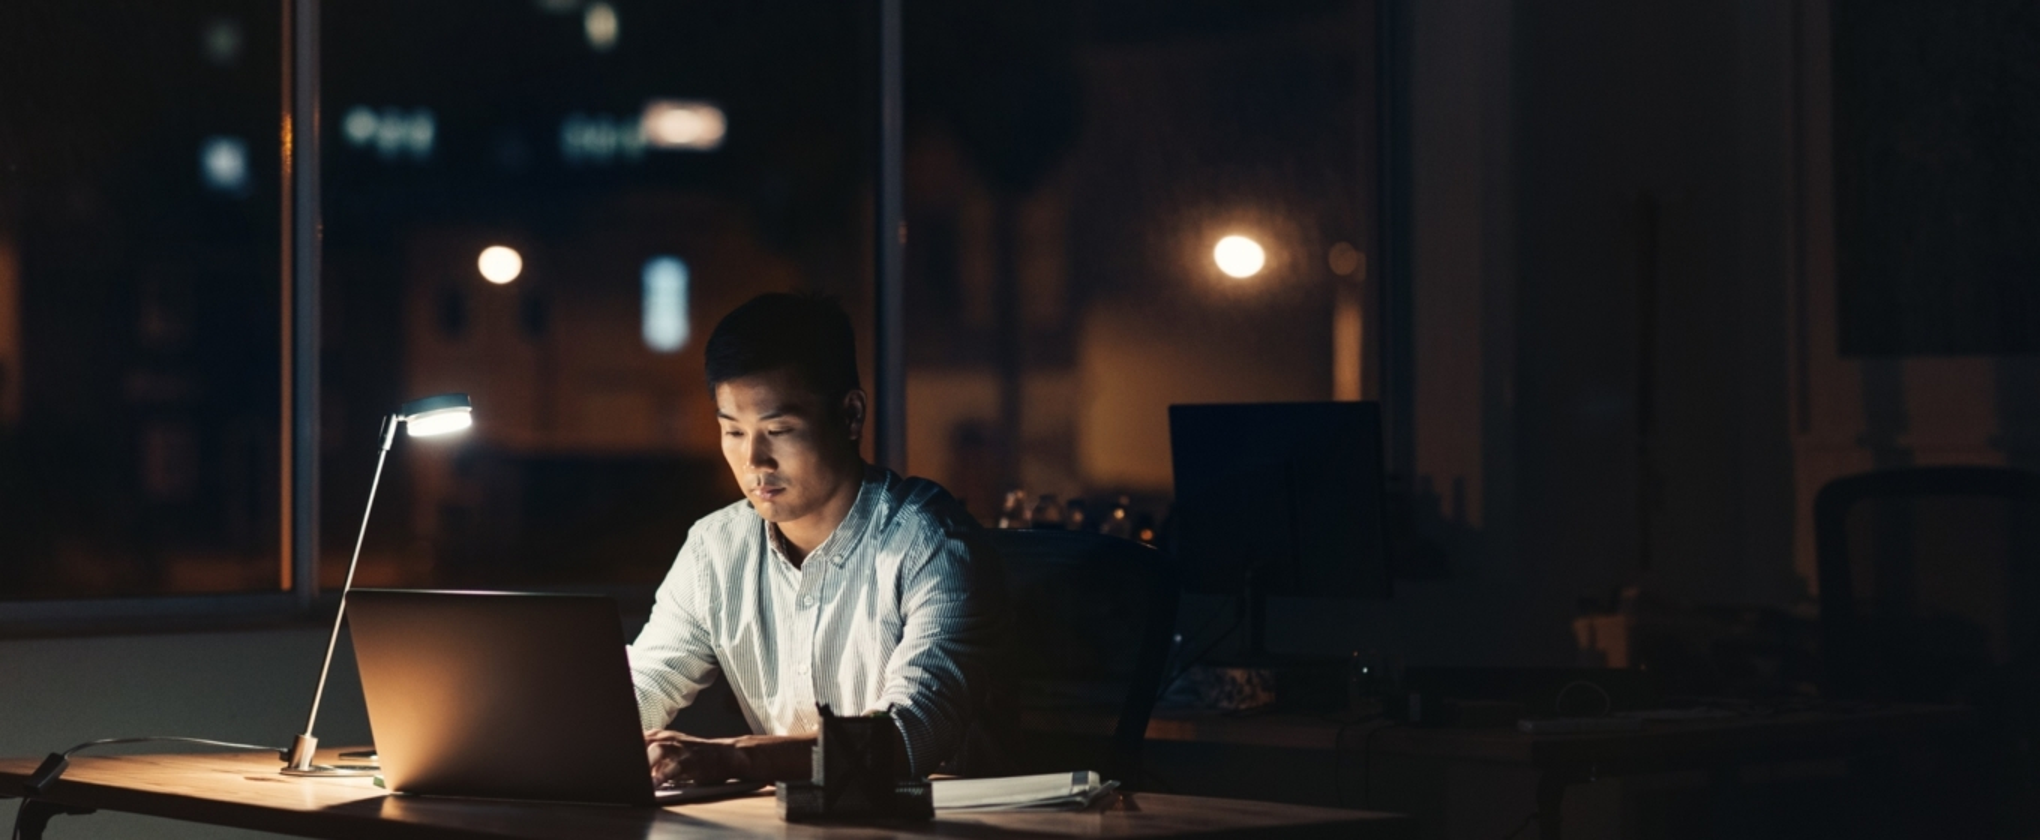 Key Criteria for Making Redundancies